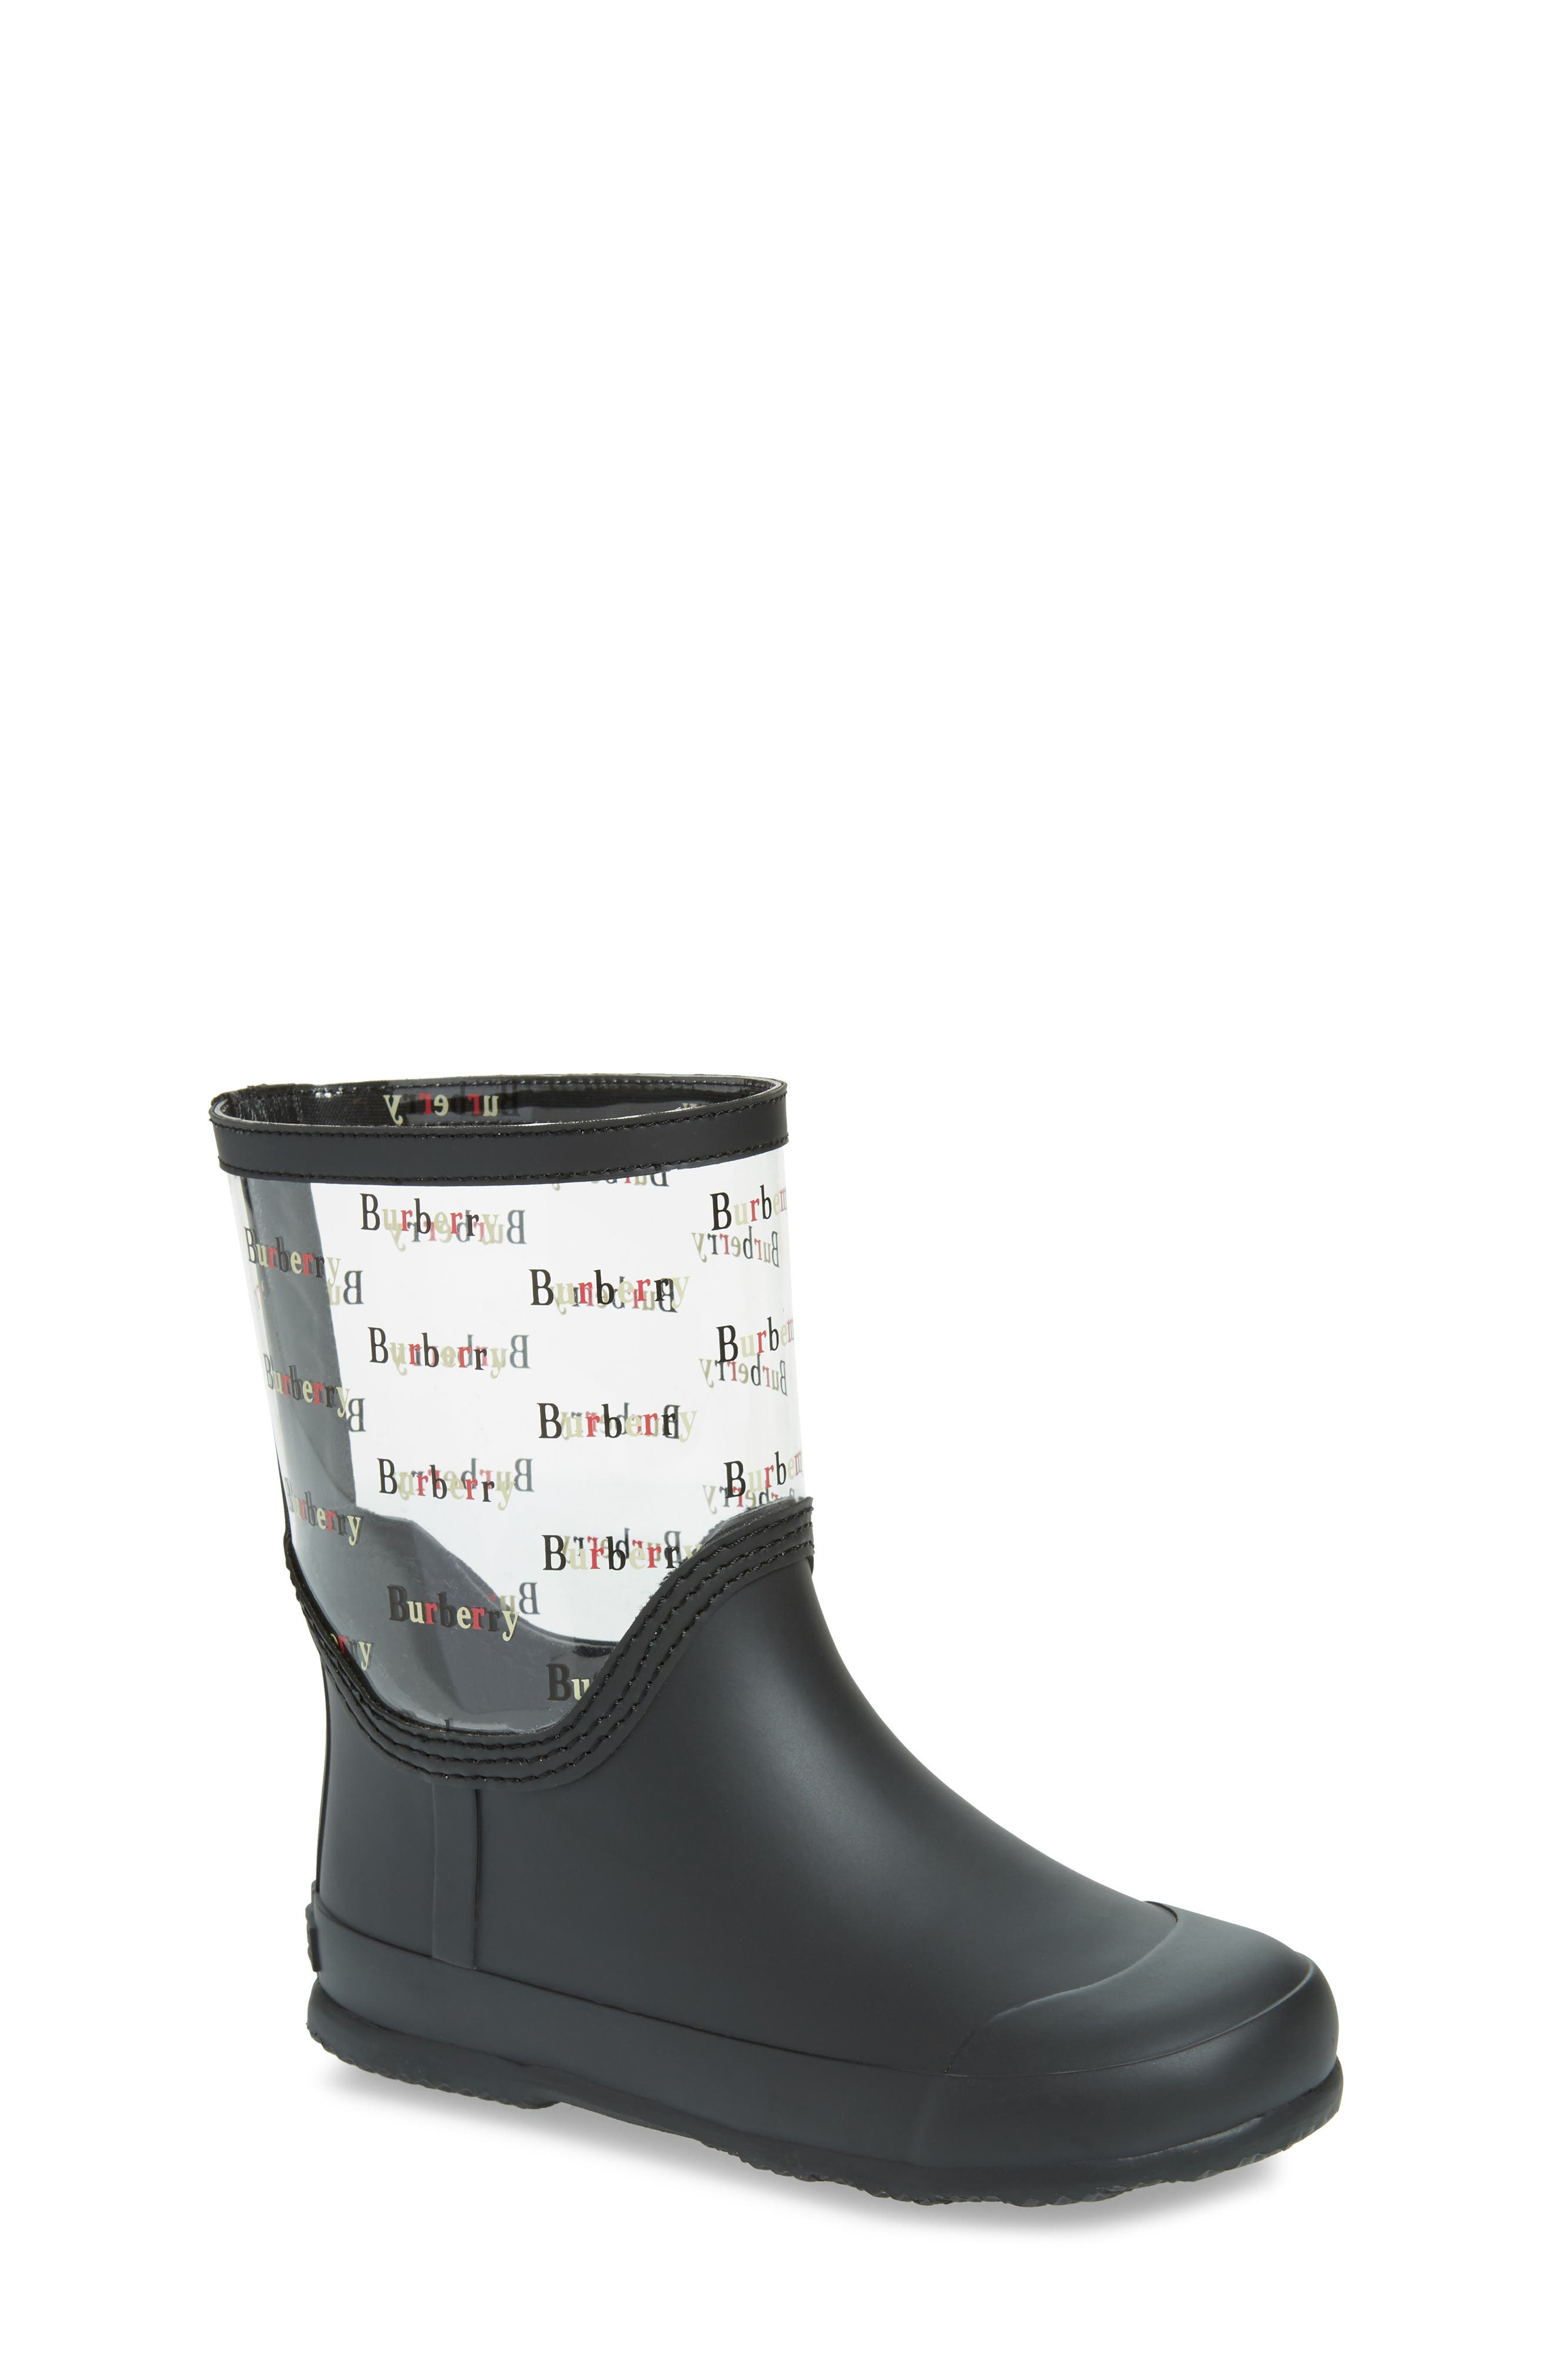 BURBERRY, Frosty Waterproof Rain Boot, Main thumbnail 1, color, BLACK